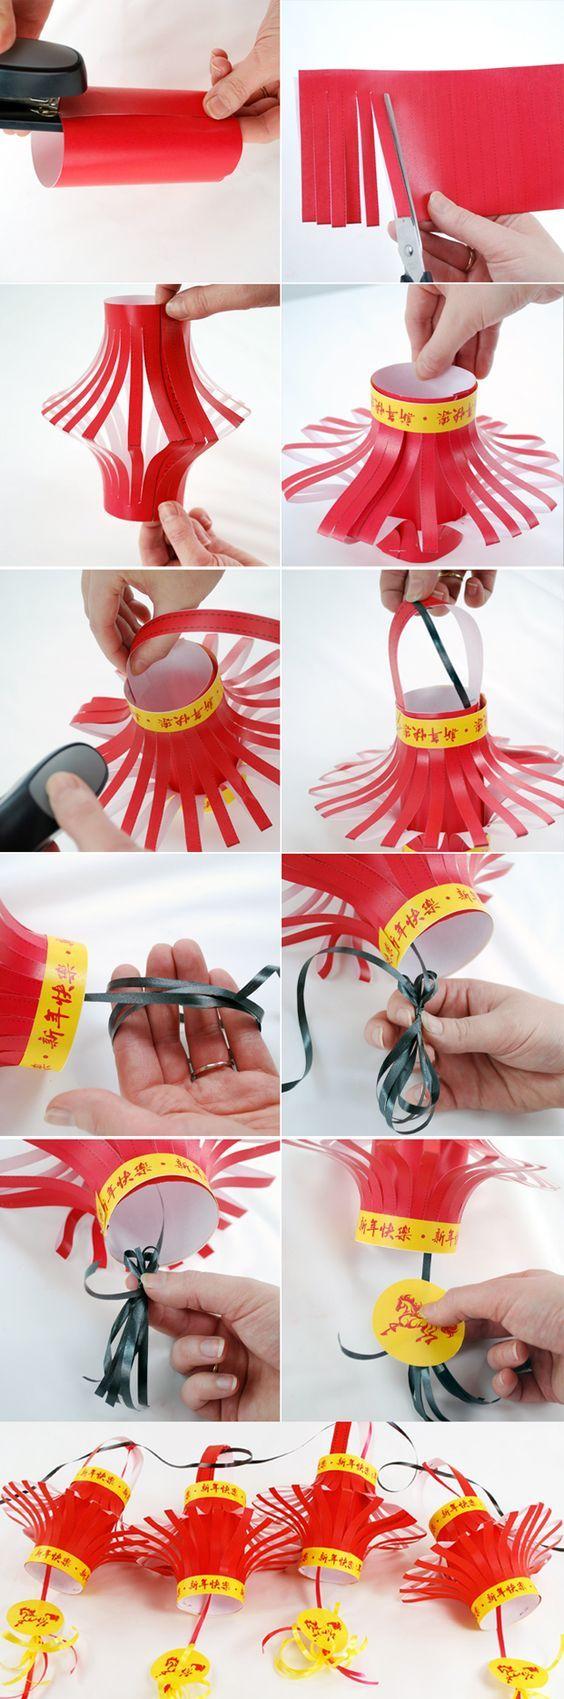 How to Make Chinese Lanterns | Chinese new year crafts ...